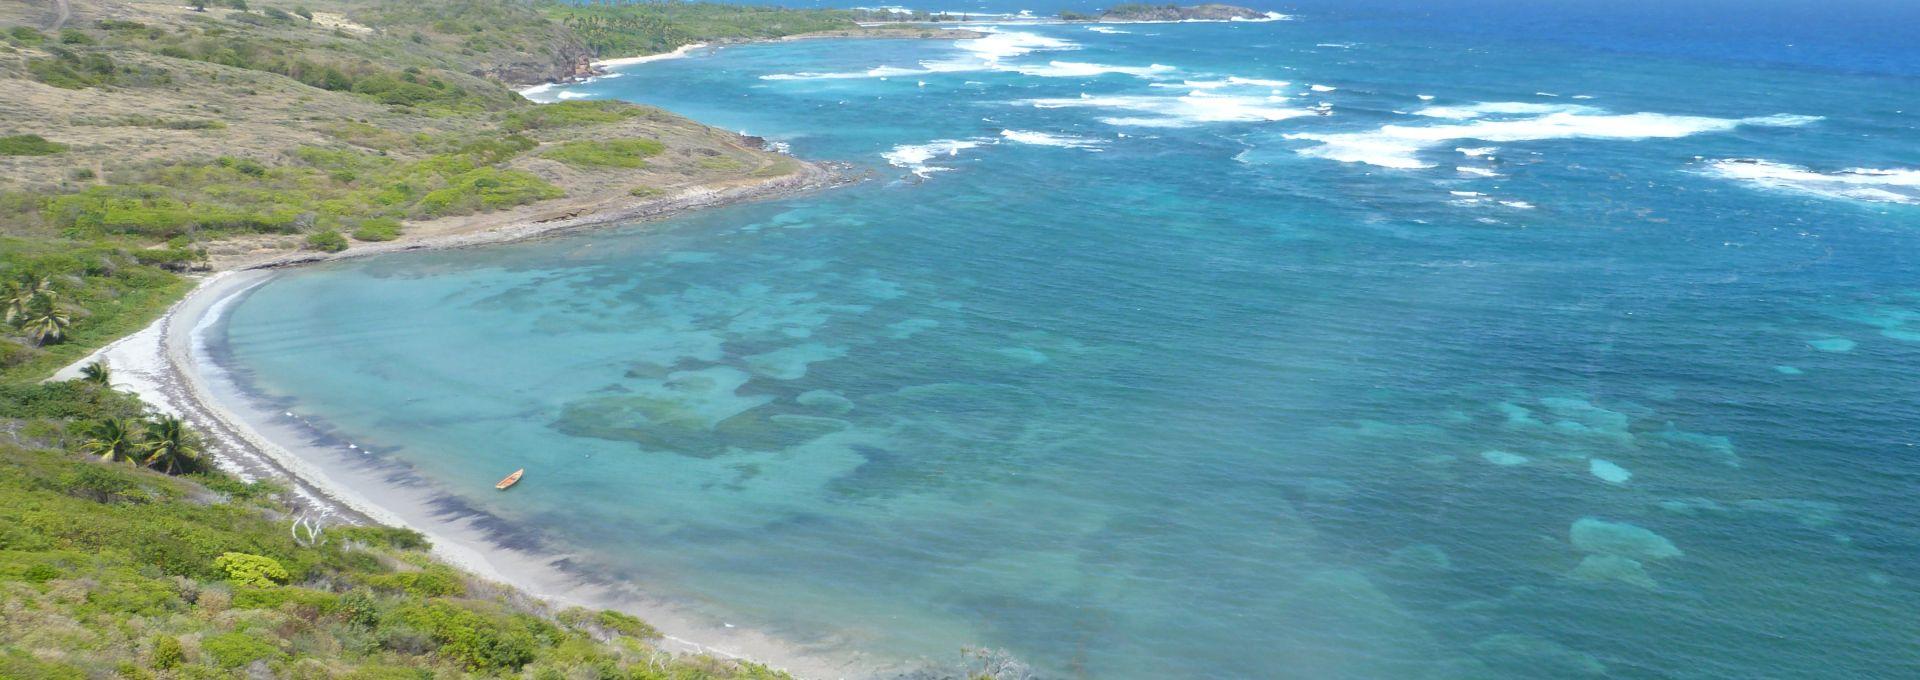 The windward coast of Martinique